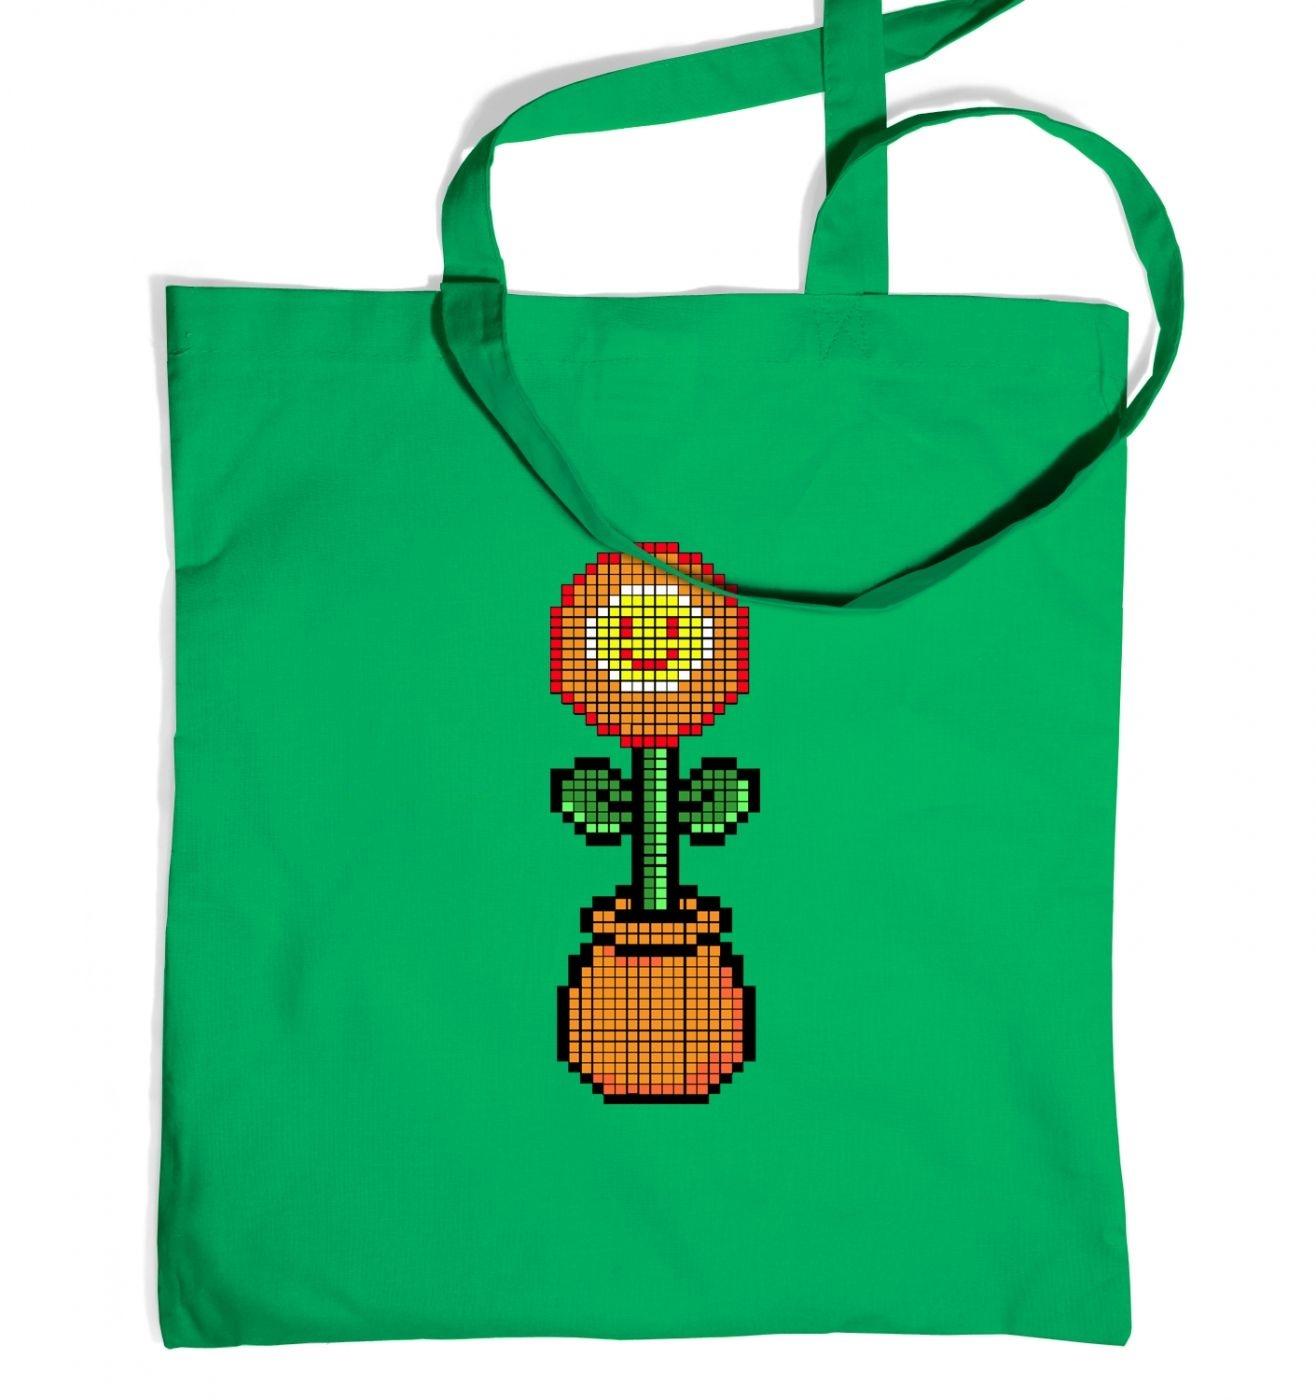 Red 8-Bit Flower tote bag